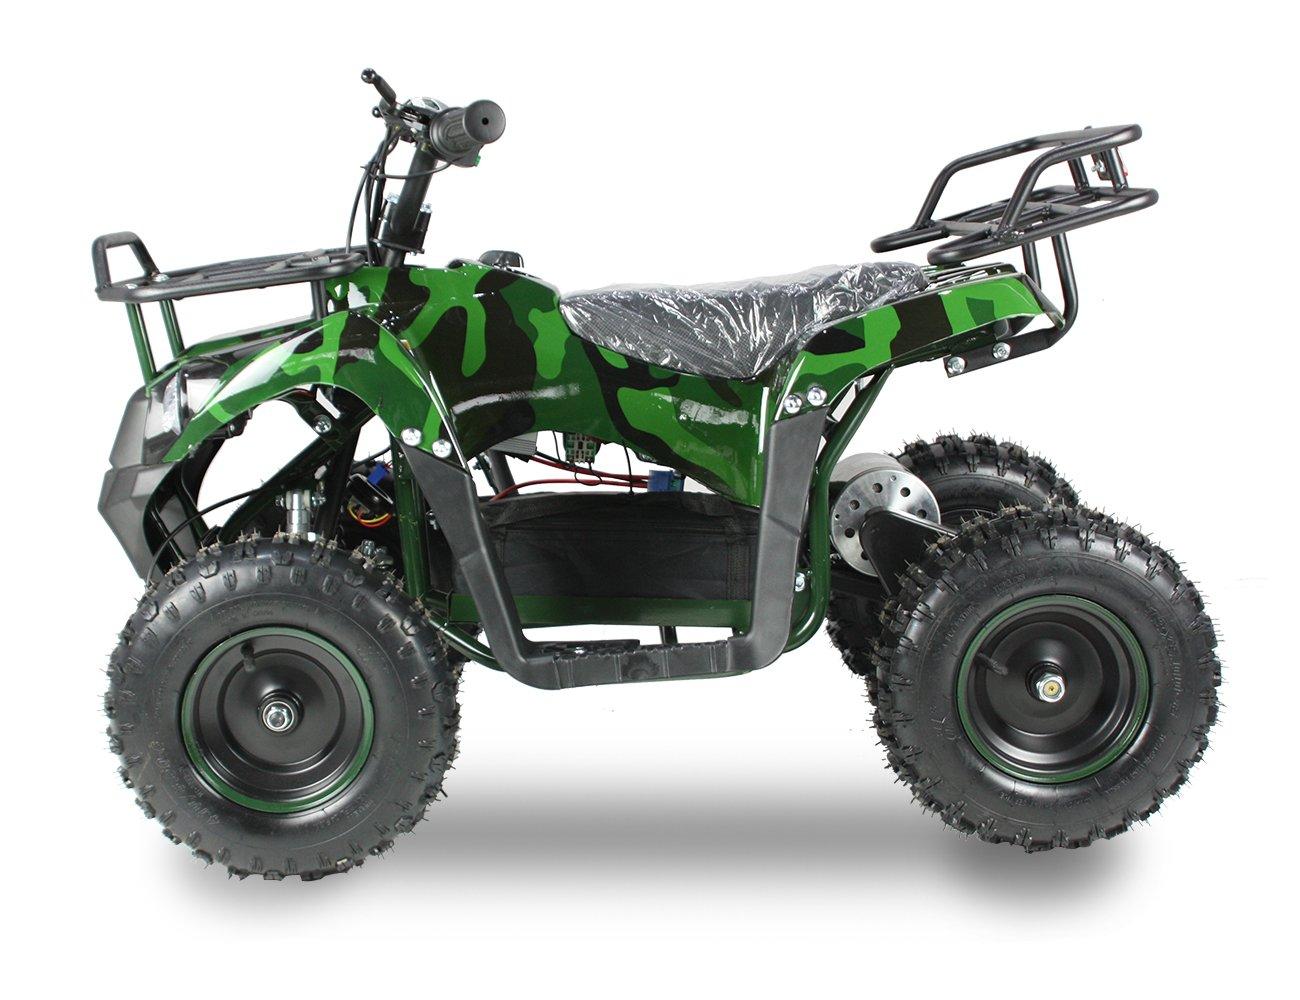 SYX MOTO 36V 800W Tank Mini ATV Dirt Quad Off Road 4 Wheelers, Camo Green